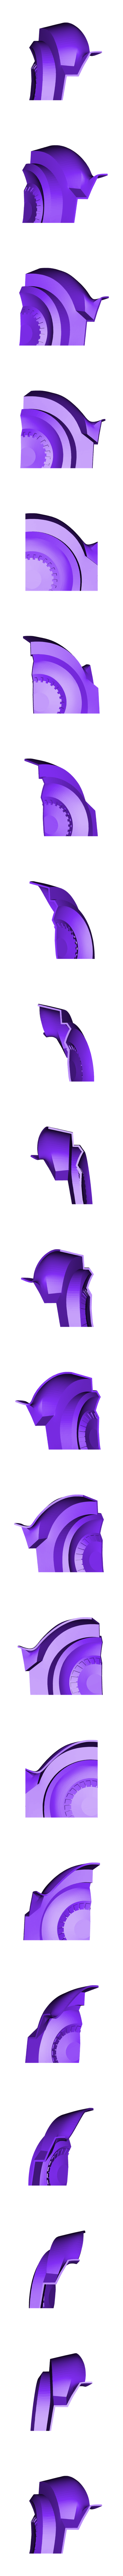 Part_17.stl Download free STL file Mass Effect N7 Breather Helmet • Template to 3D print, VillainousPropShop